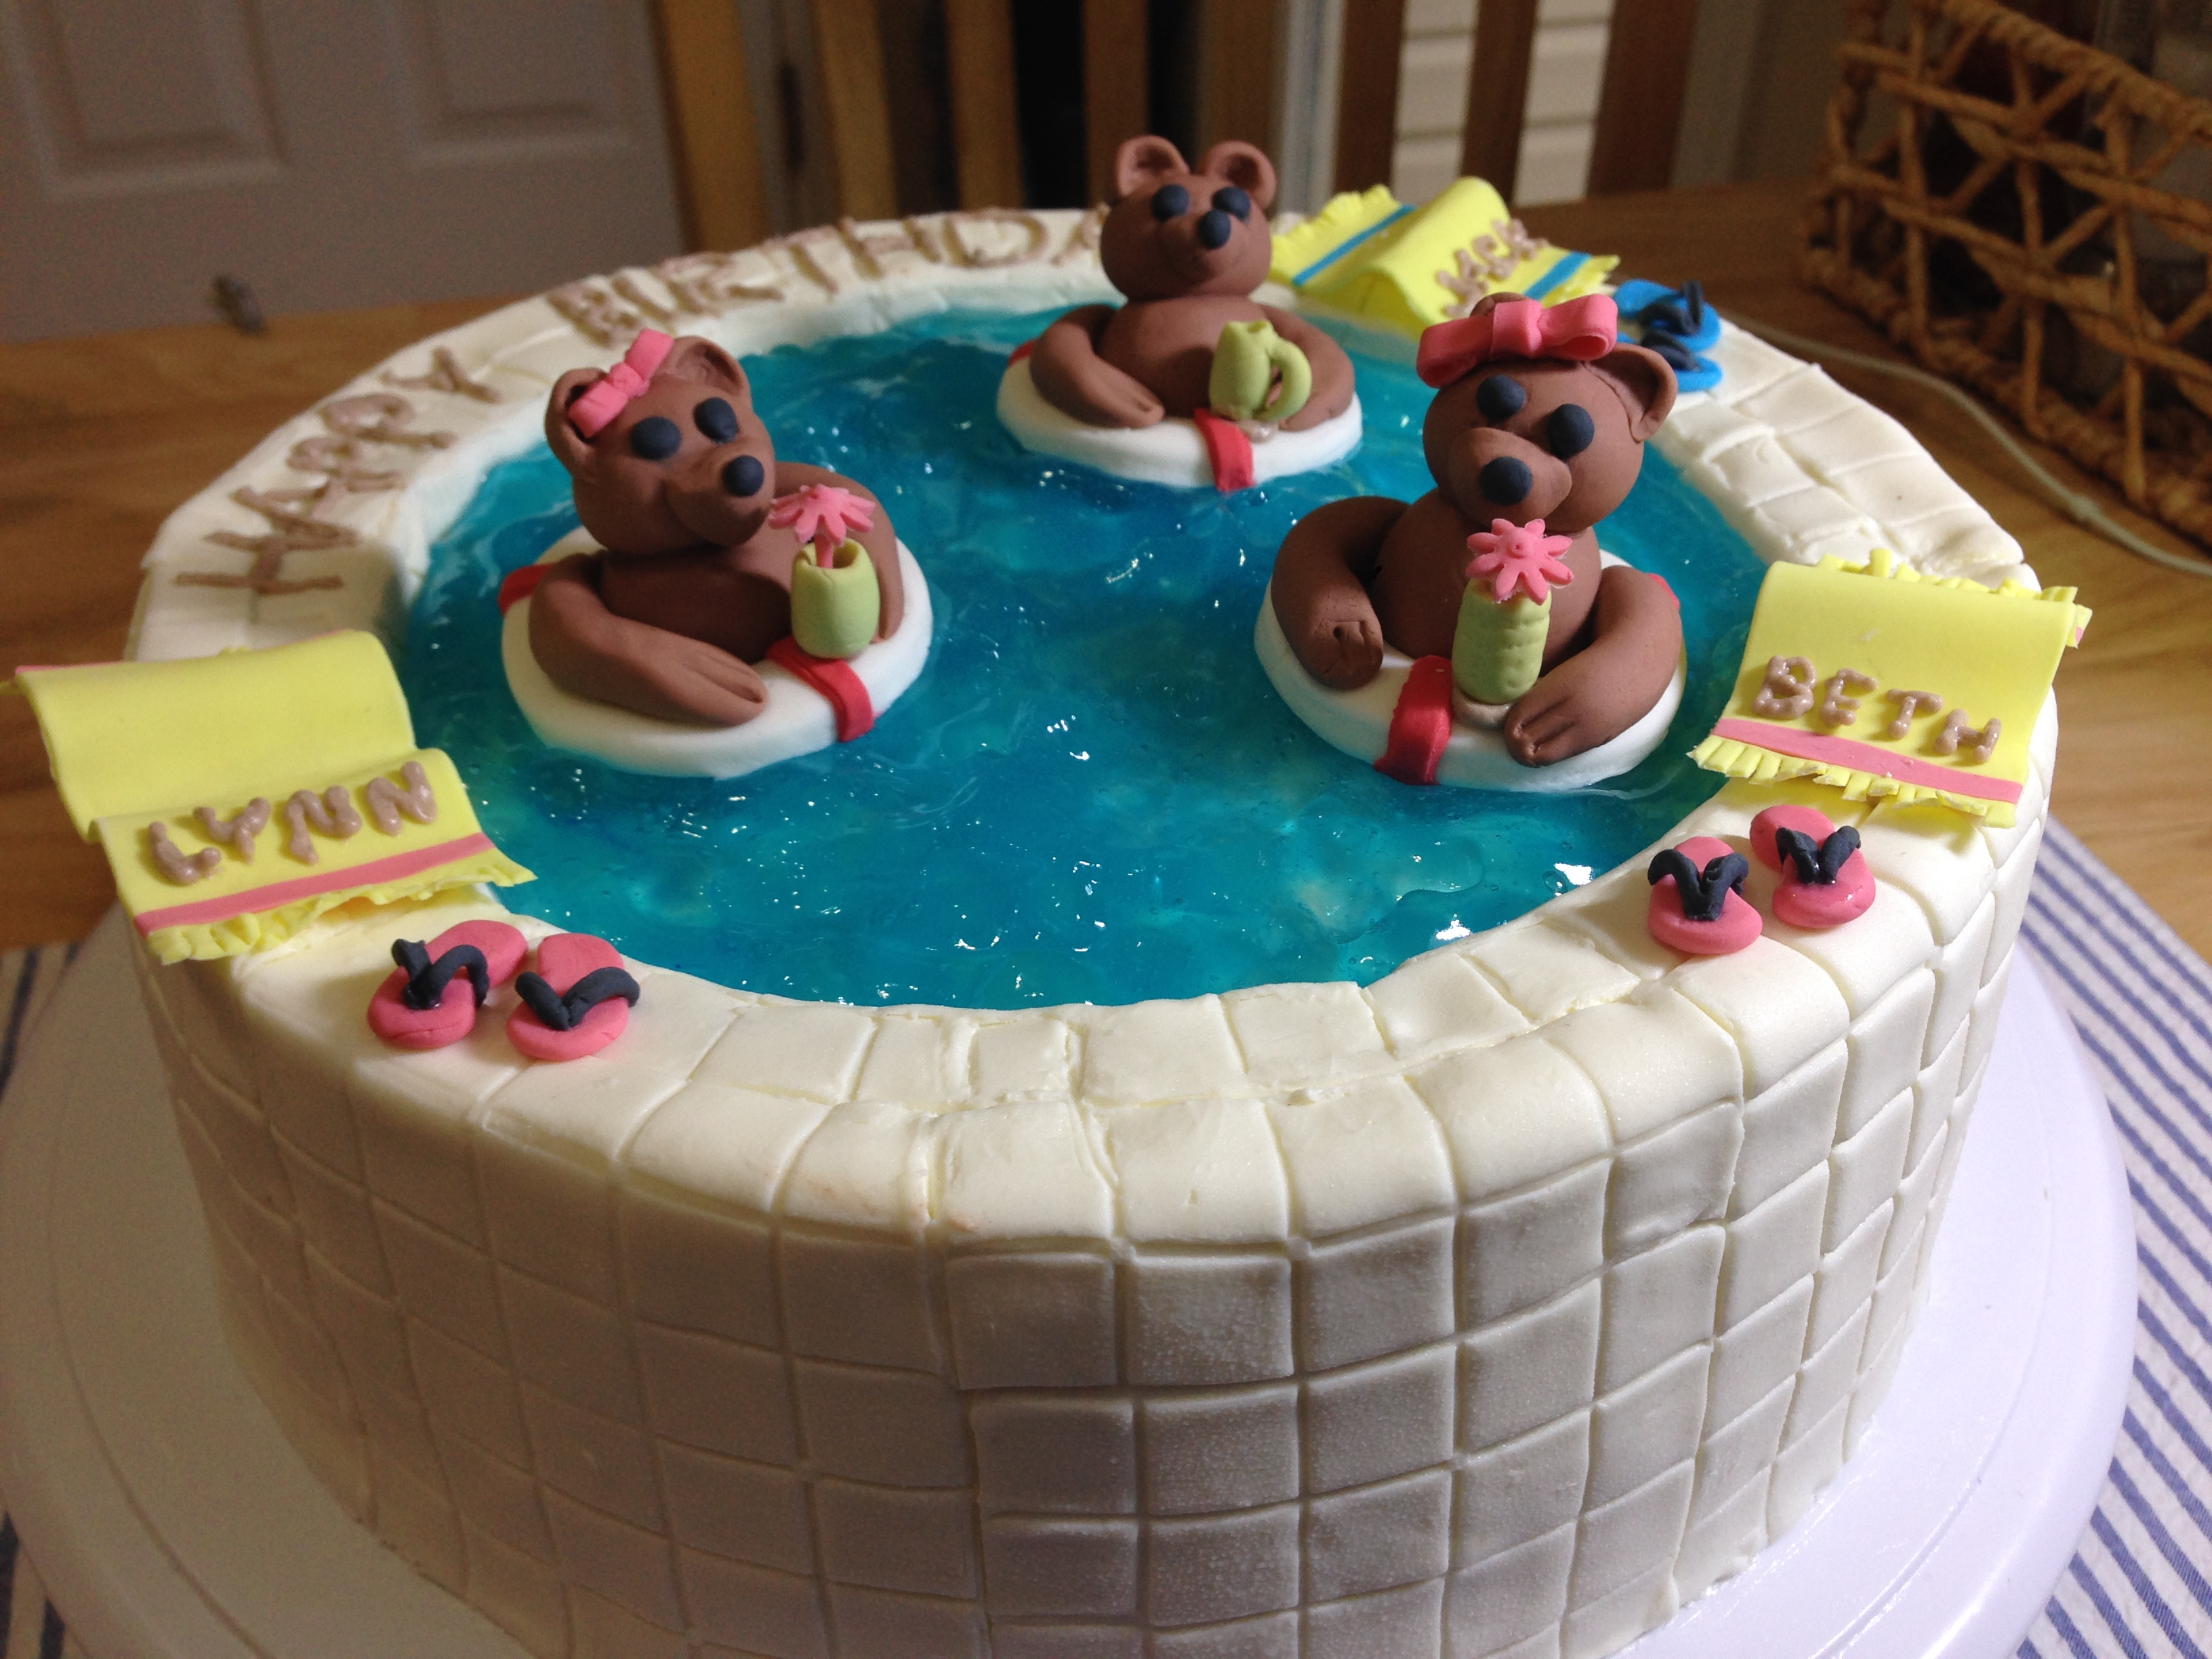 Cake Decorating   Renewed interest in an old hobby DeborahFillmer.com